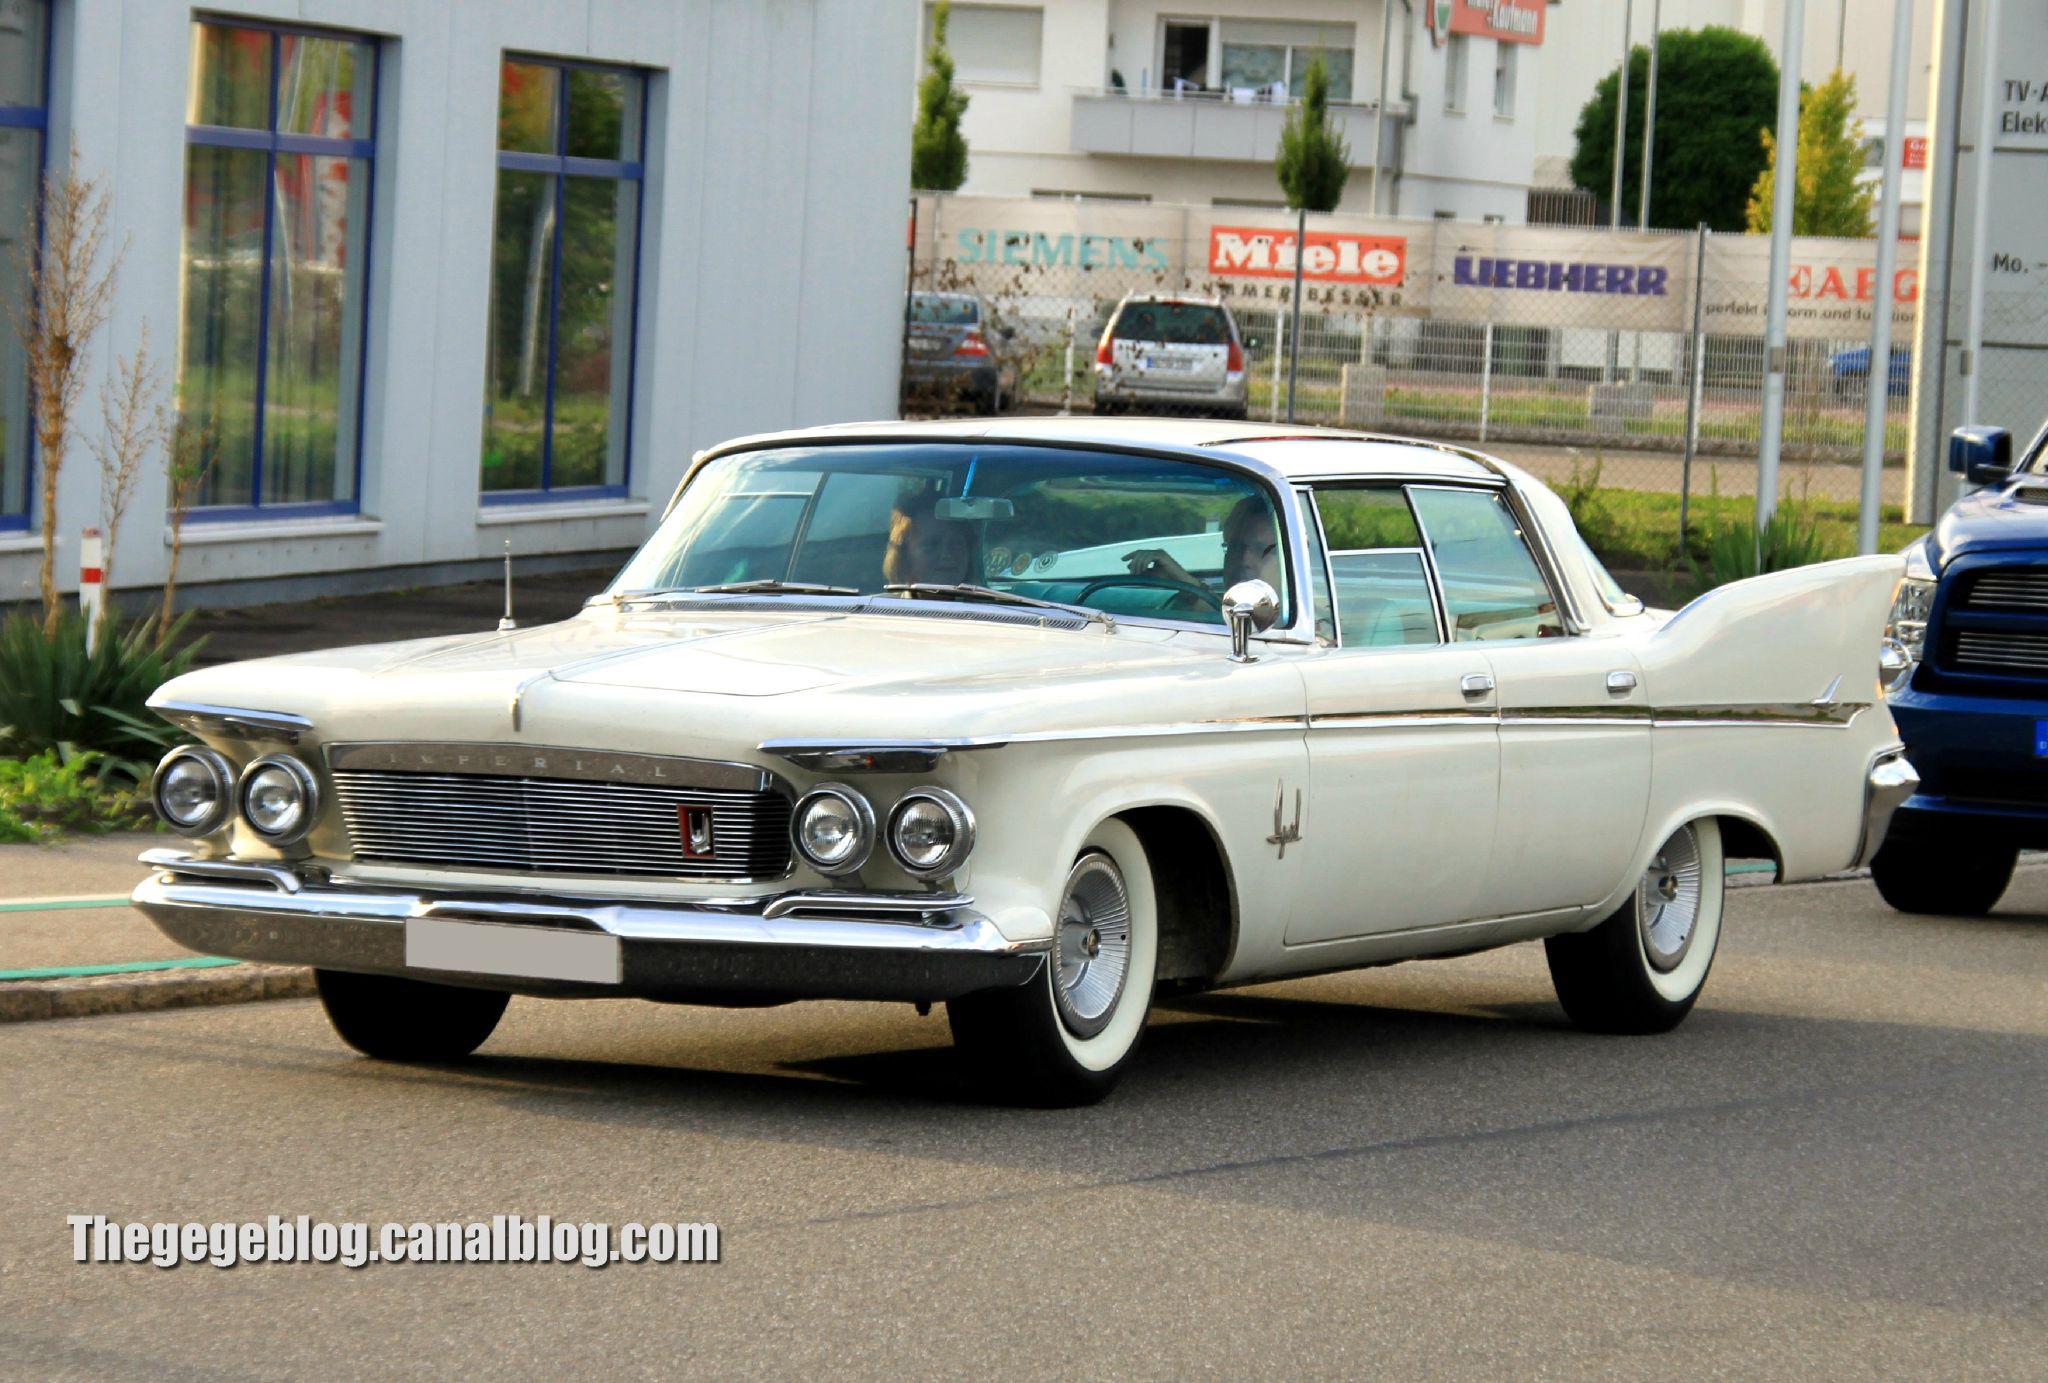 Imperial crown de 1961 (Rencard Burger King aout 2012) 01